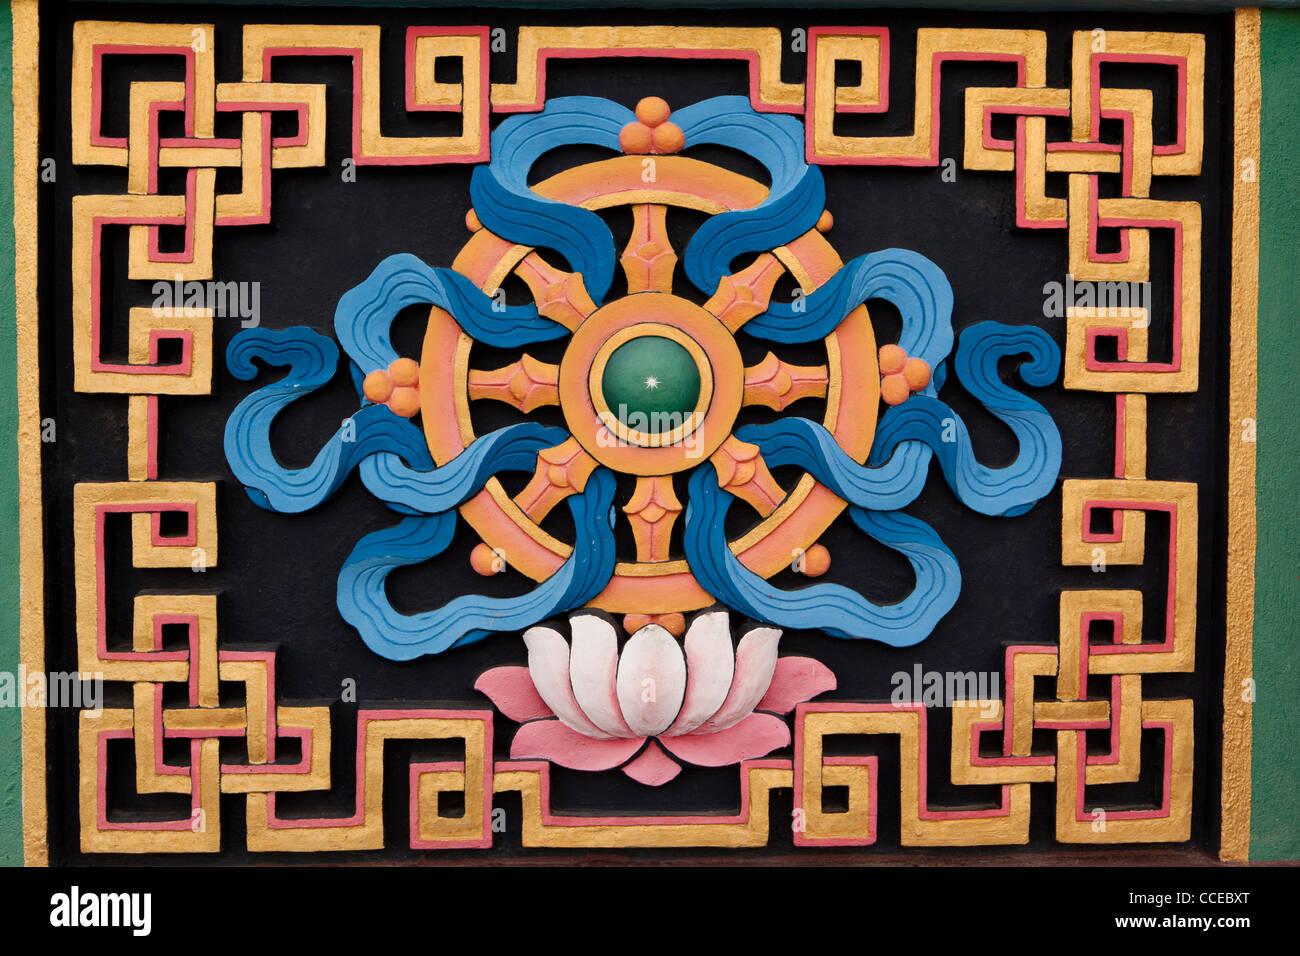 India, Arunachal Pradesh, Tawang, Khinmey Nyingma Monastery, Wheel, dharmachakra, auspicious symbol - Stock Image